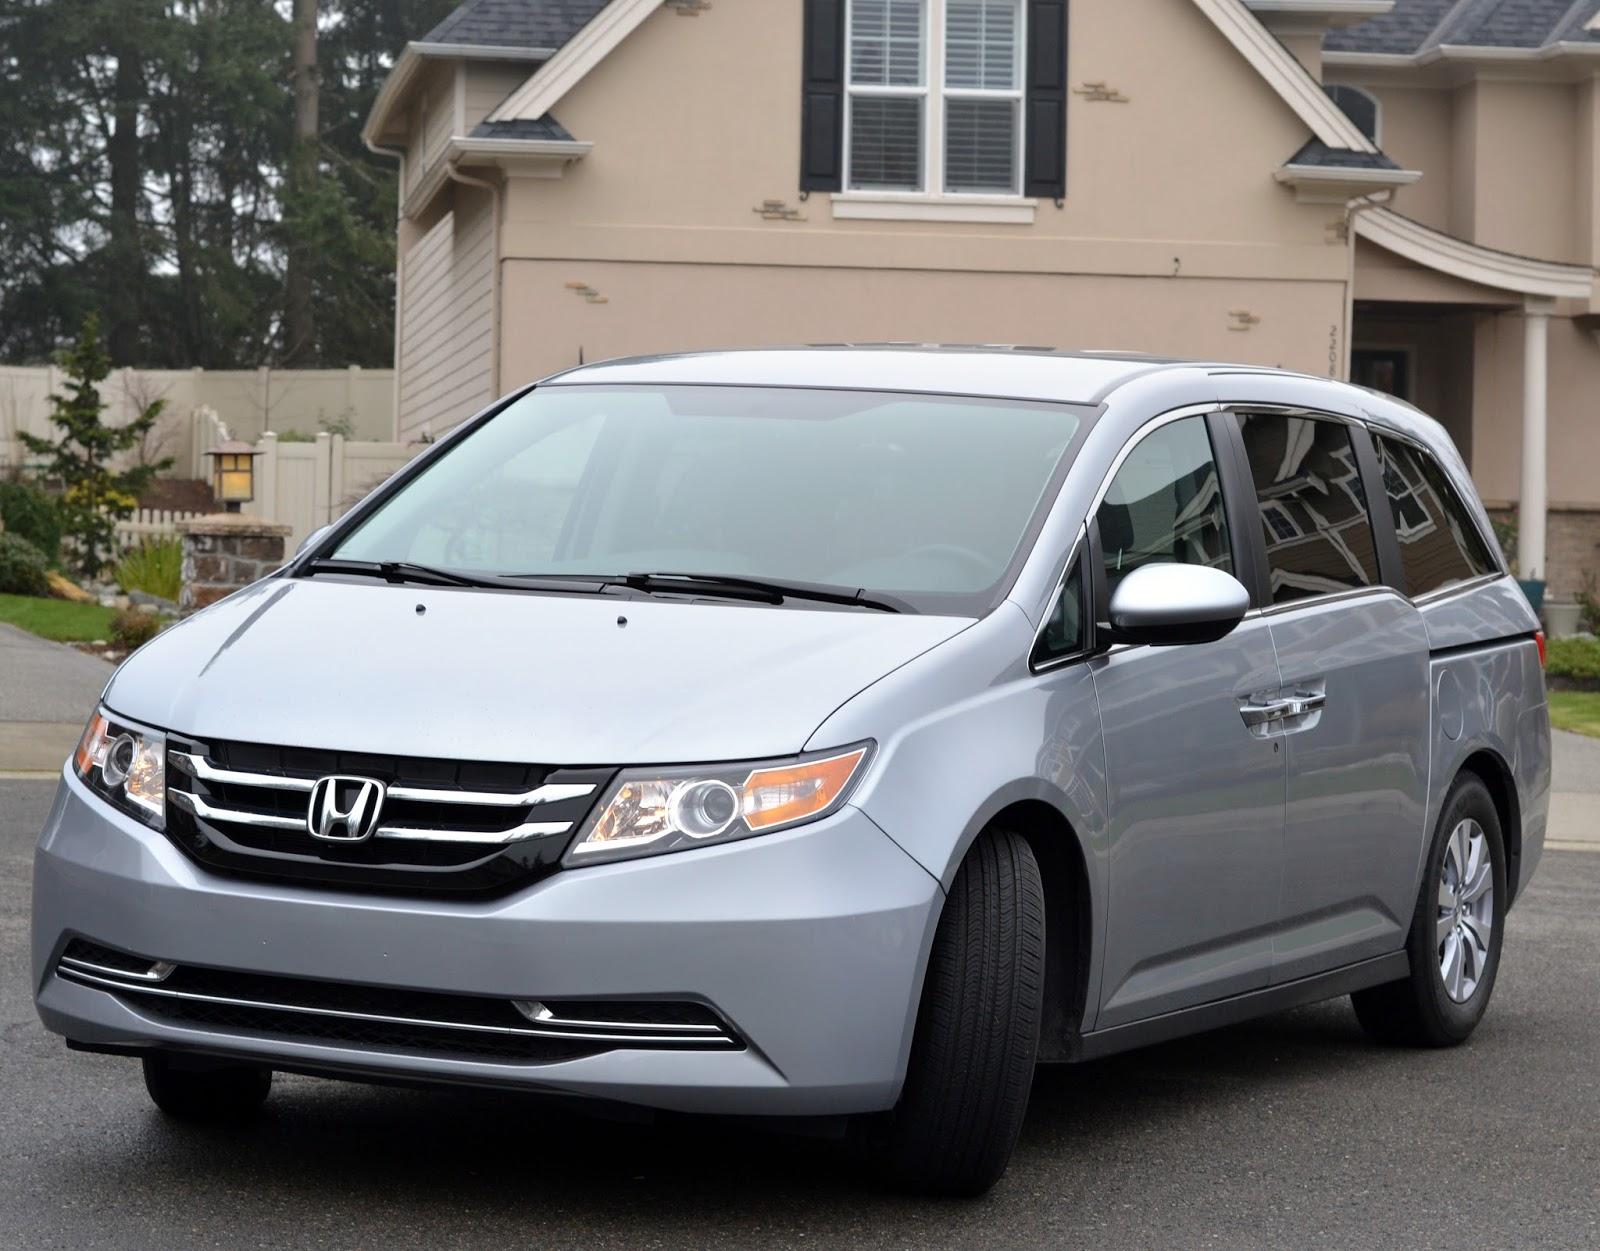 The honda odyssey mini van review rachel teodoro for Honda odyssey minivan